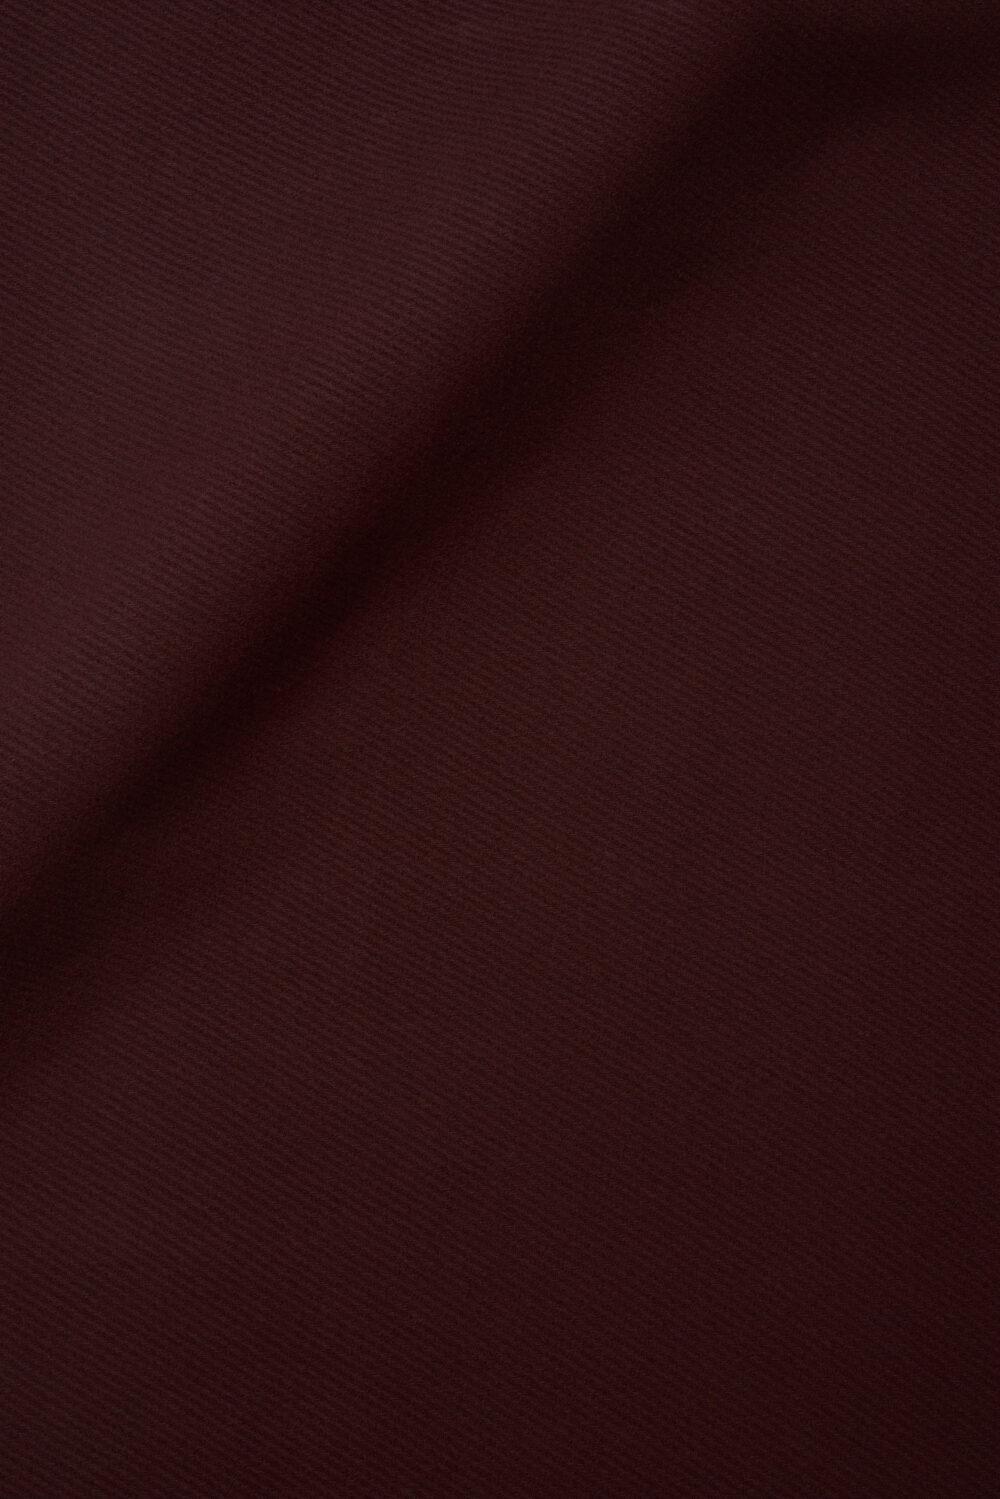 Dzūkiškas įv. spalvų švarkelis SVR4